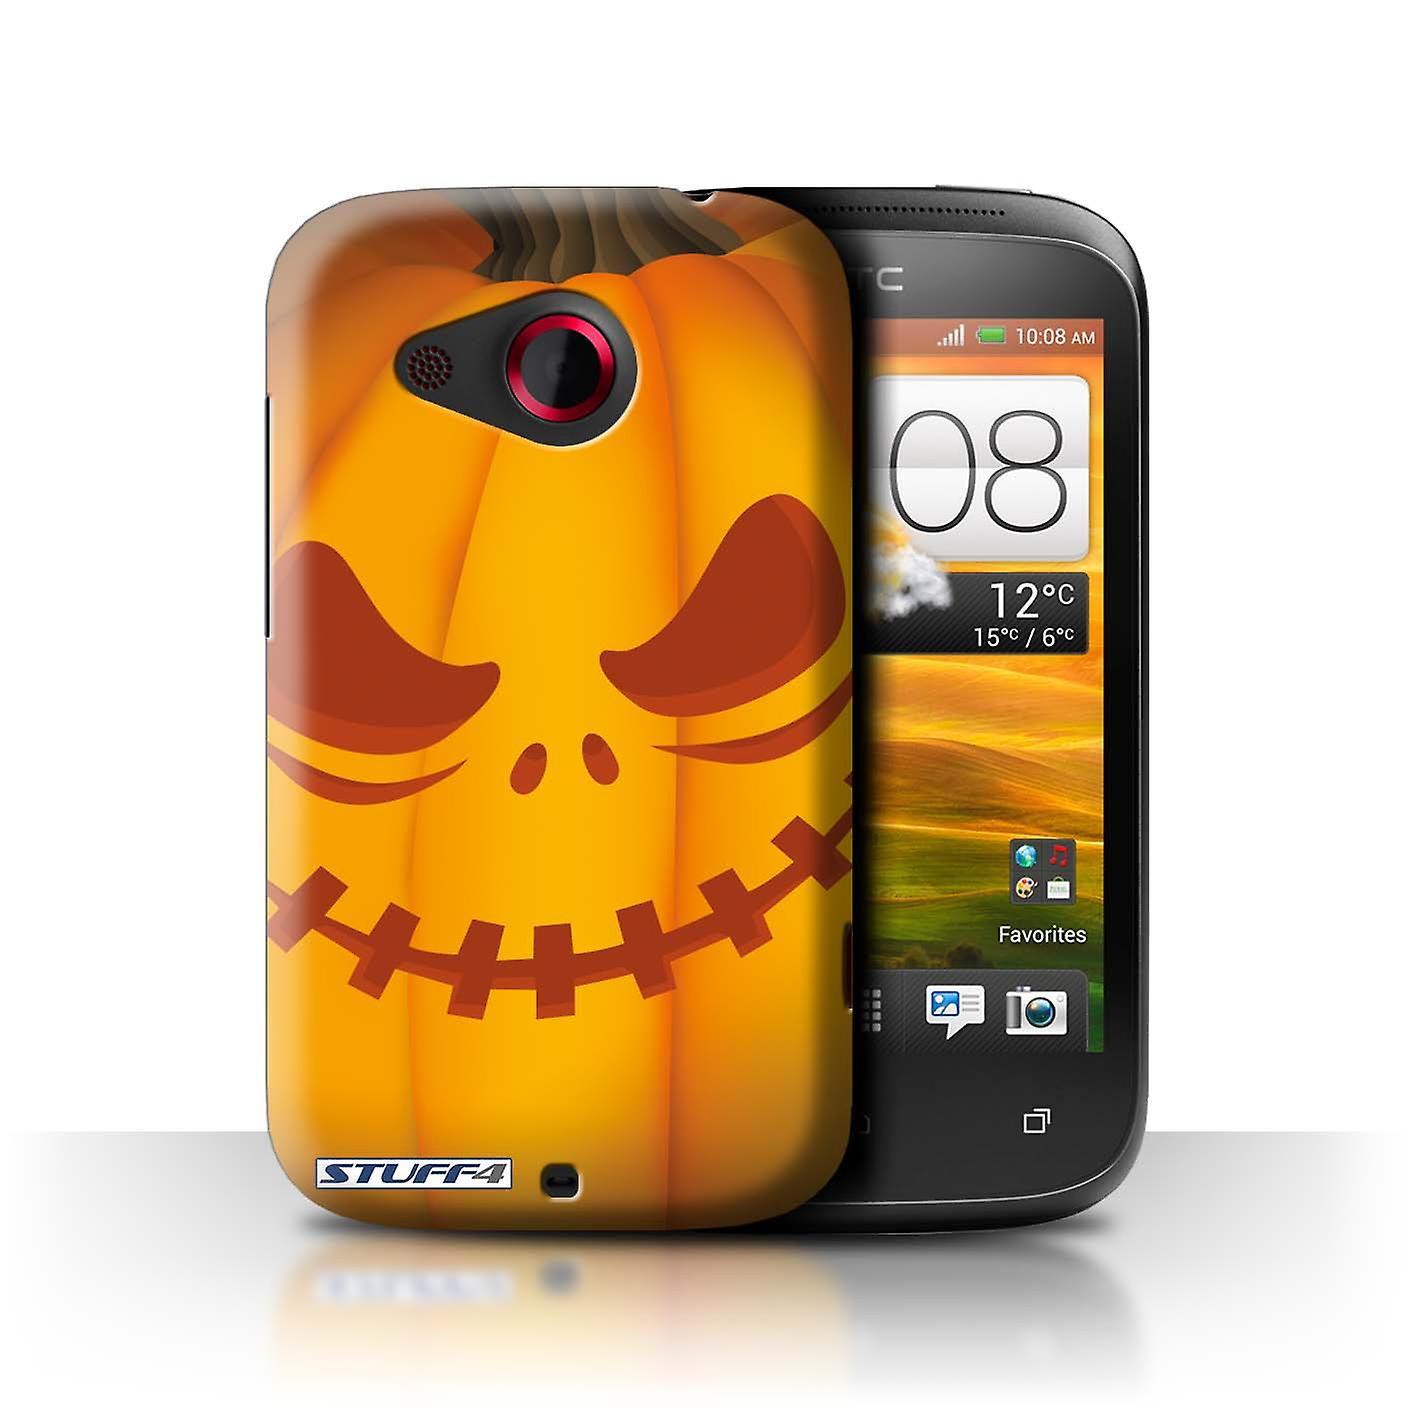 Halloween Klamotten Schön Stuff4 Case Cover for Htc Desire C Scary Halloween Pumpkin